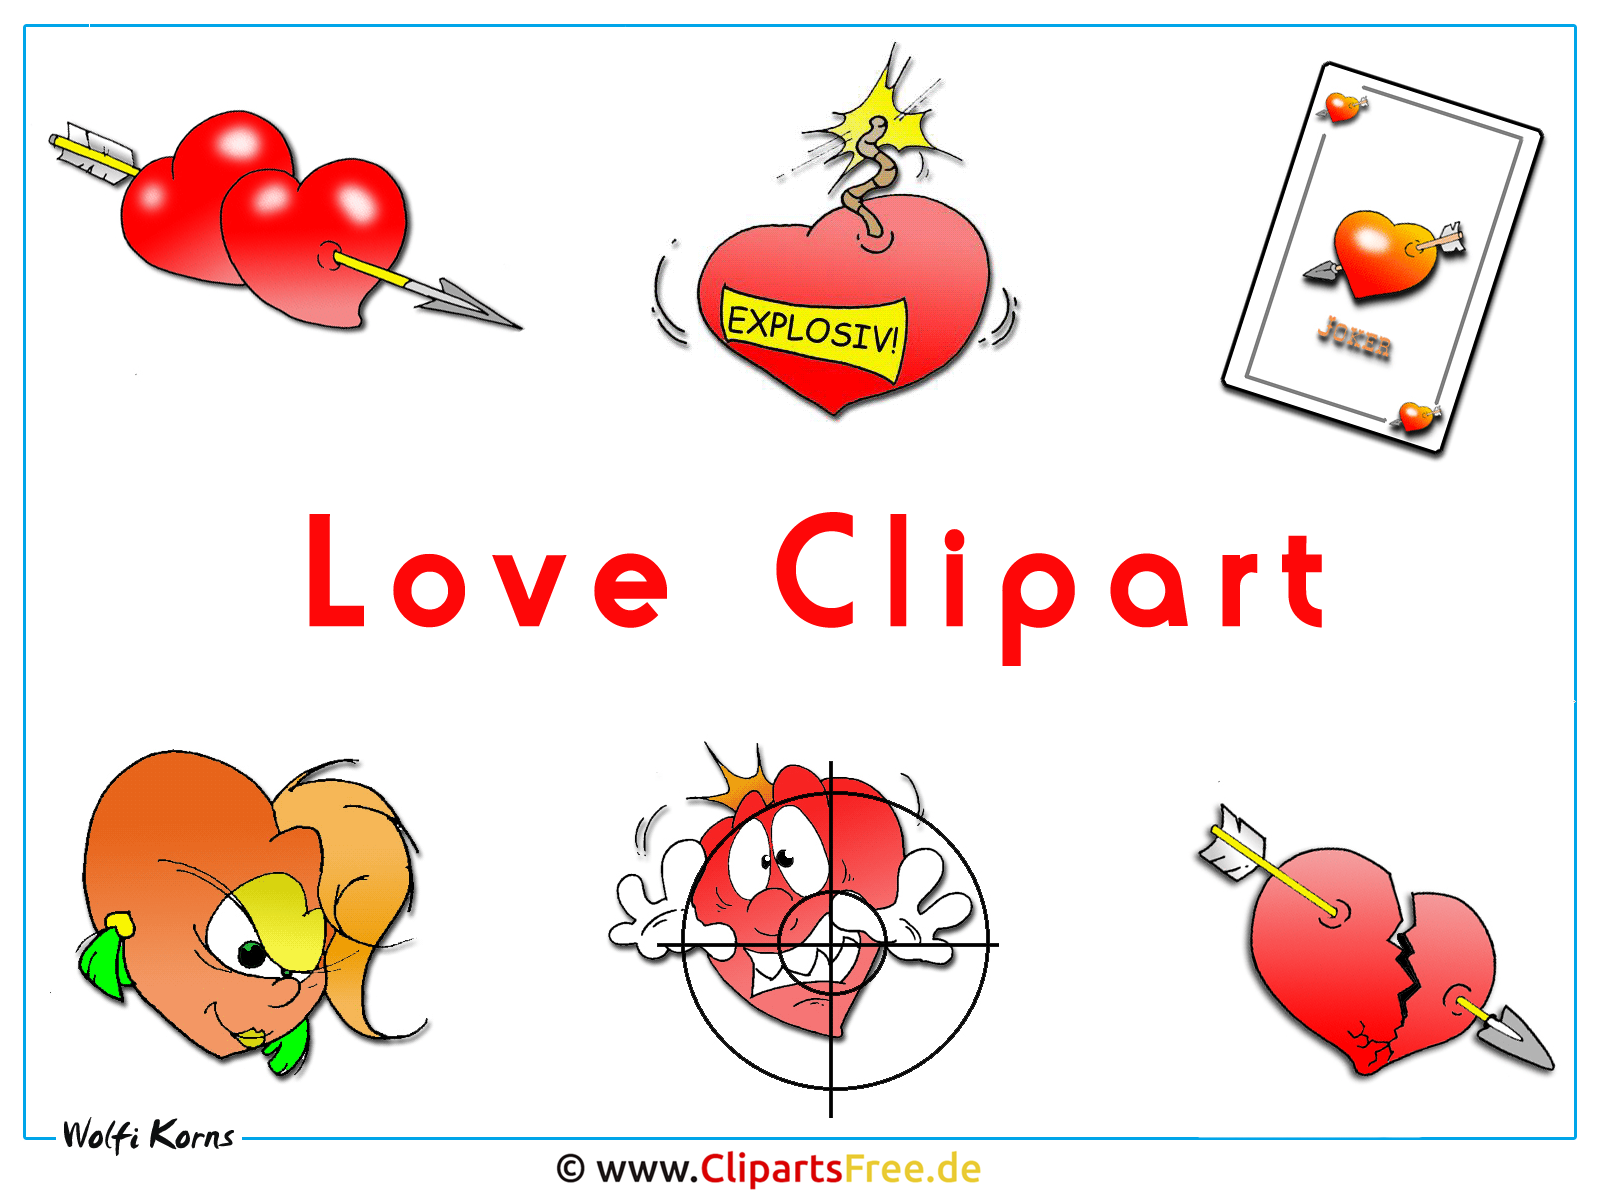 Liebe Clipart Wallpaper free download